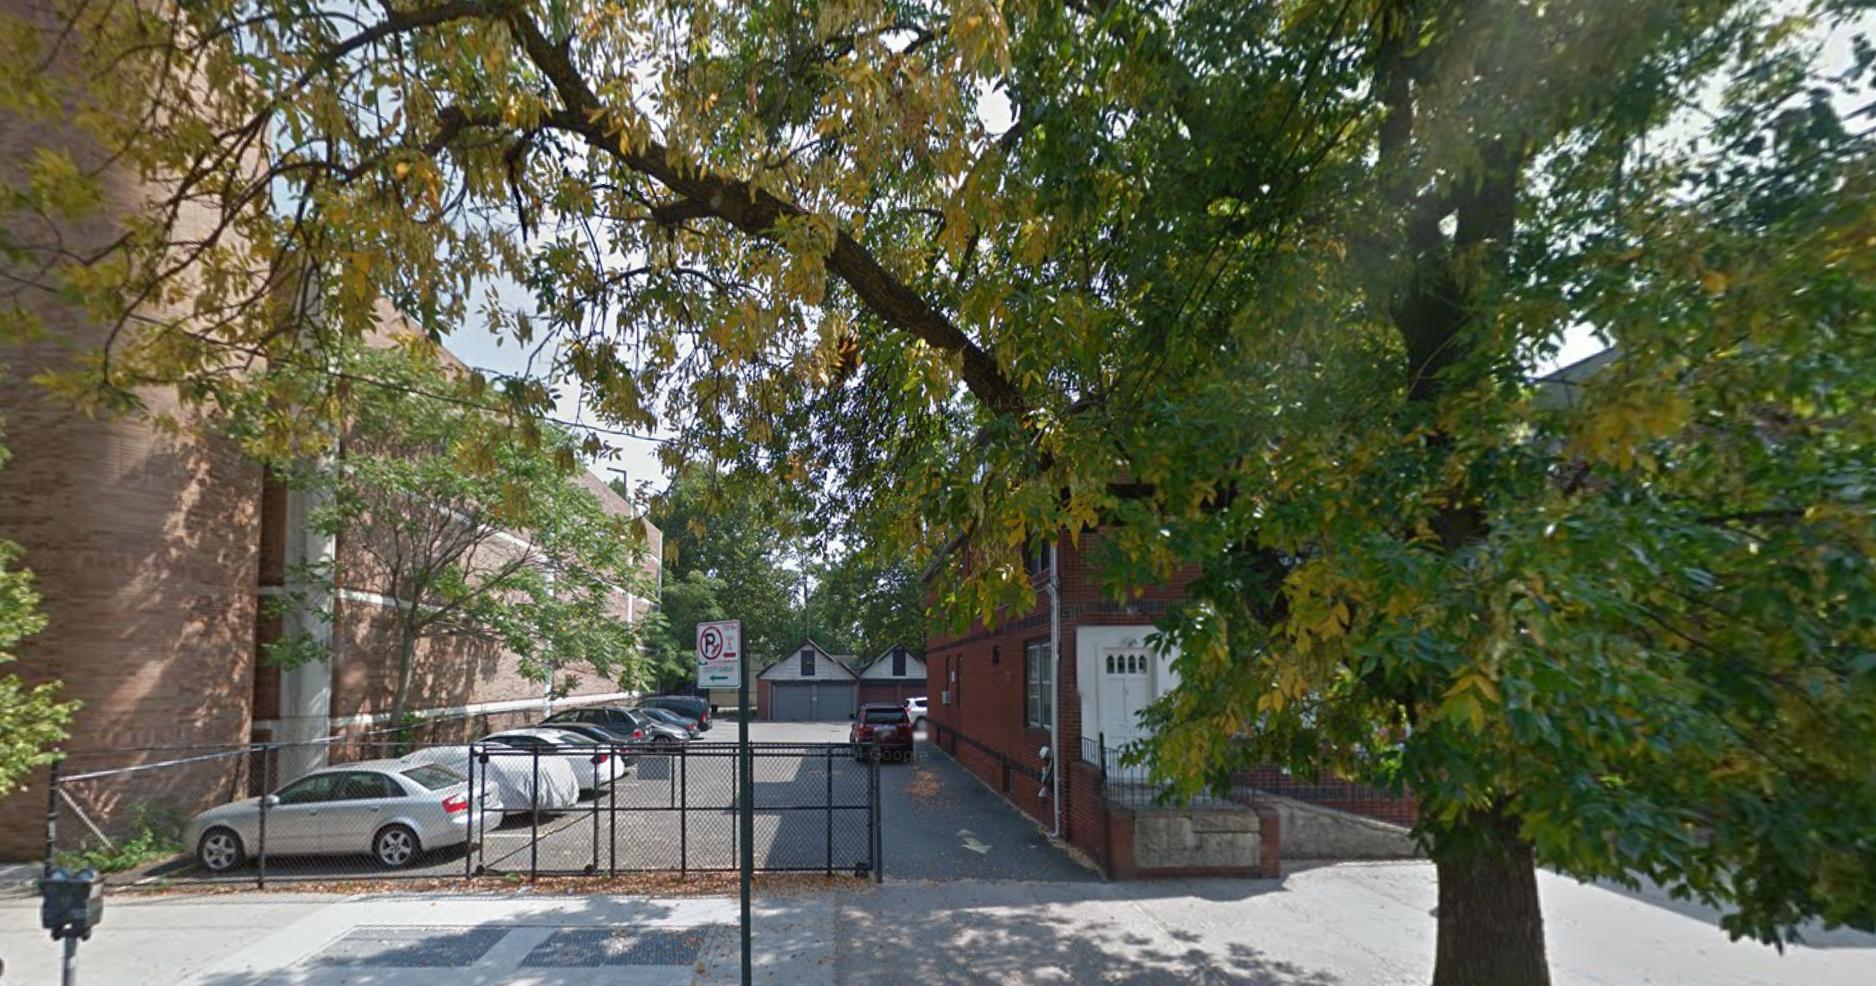 87-12 58th Avenue, image via Google Maps